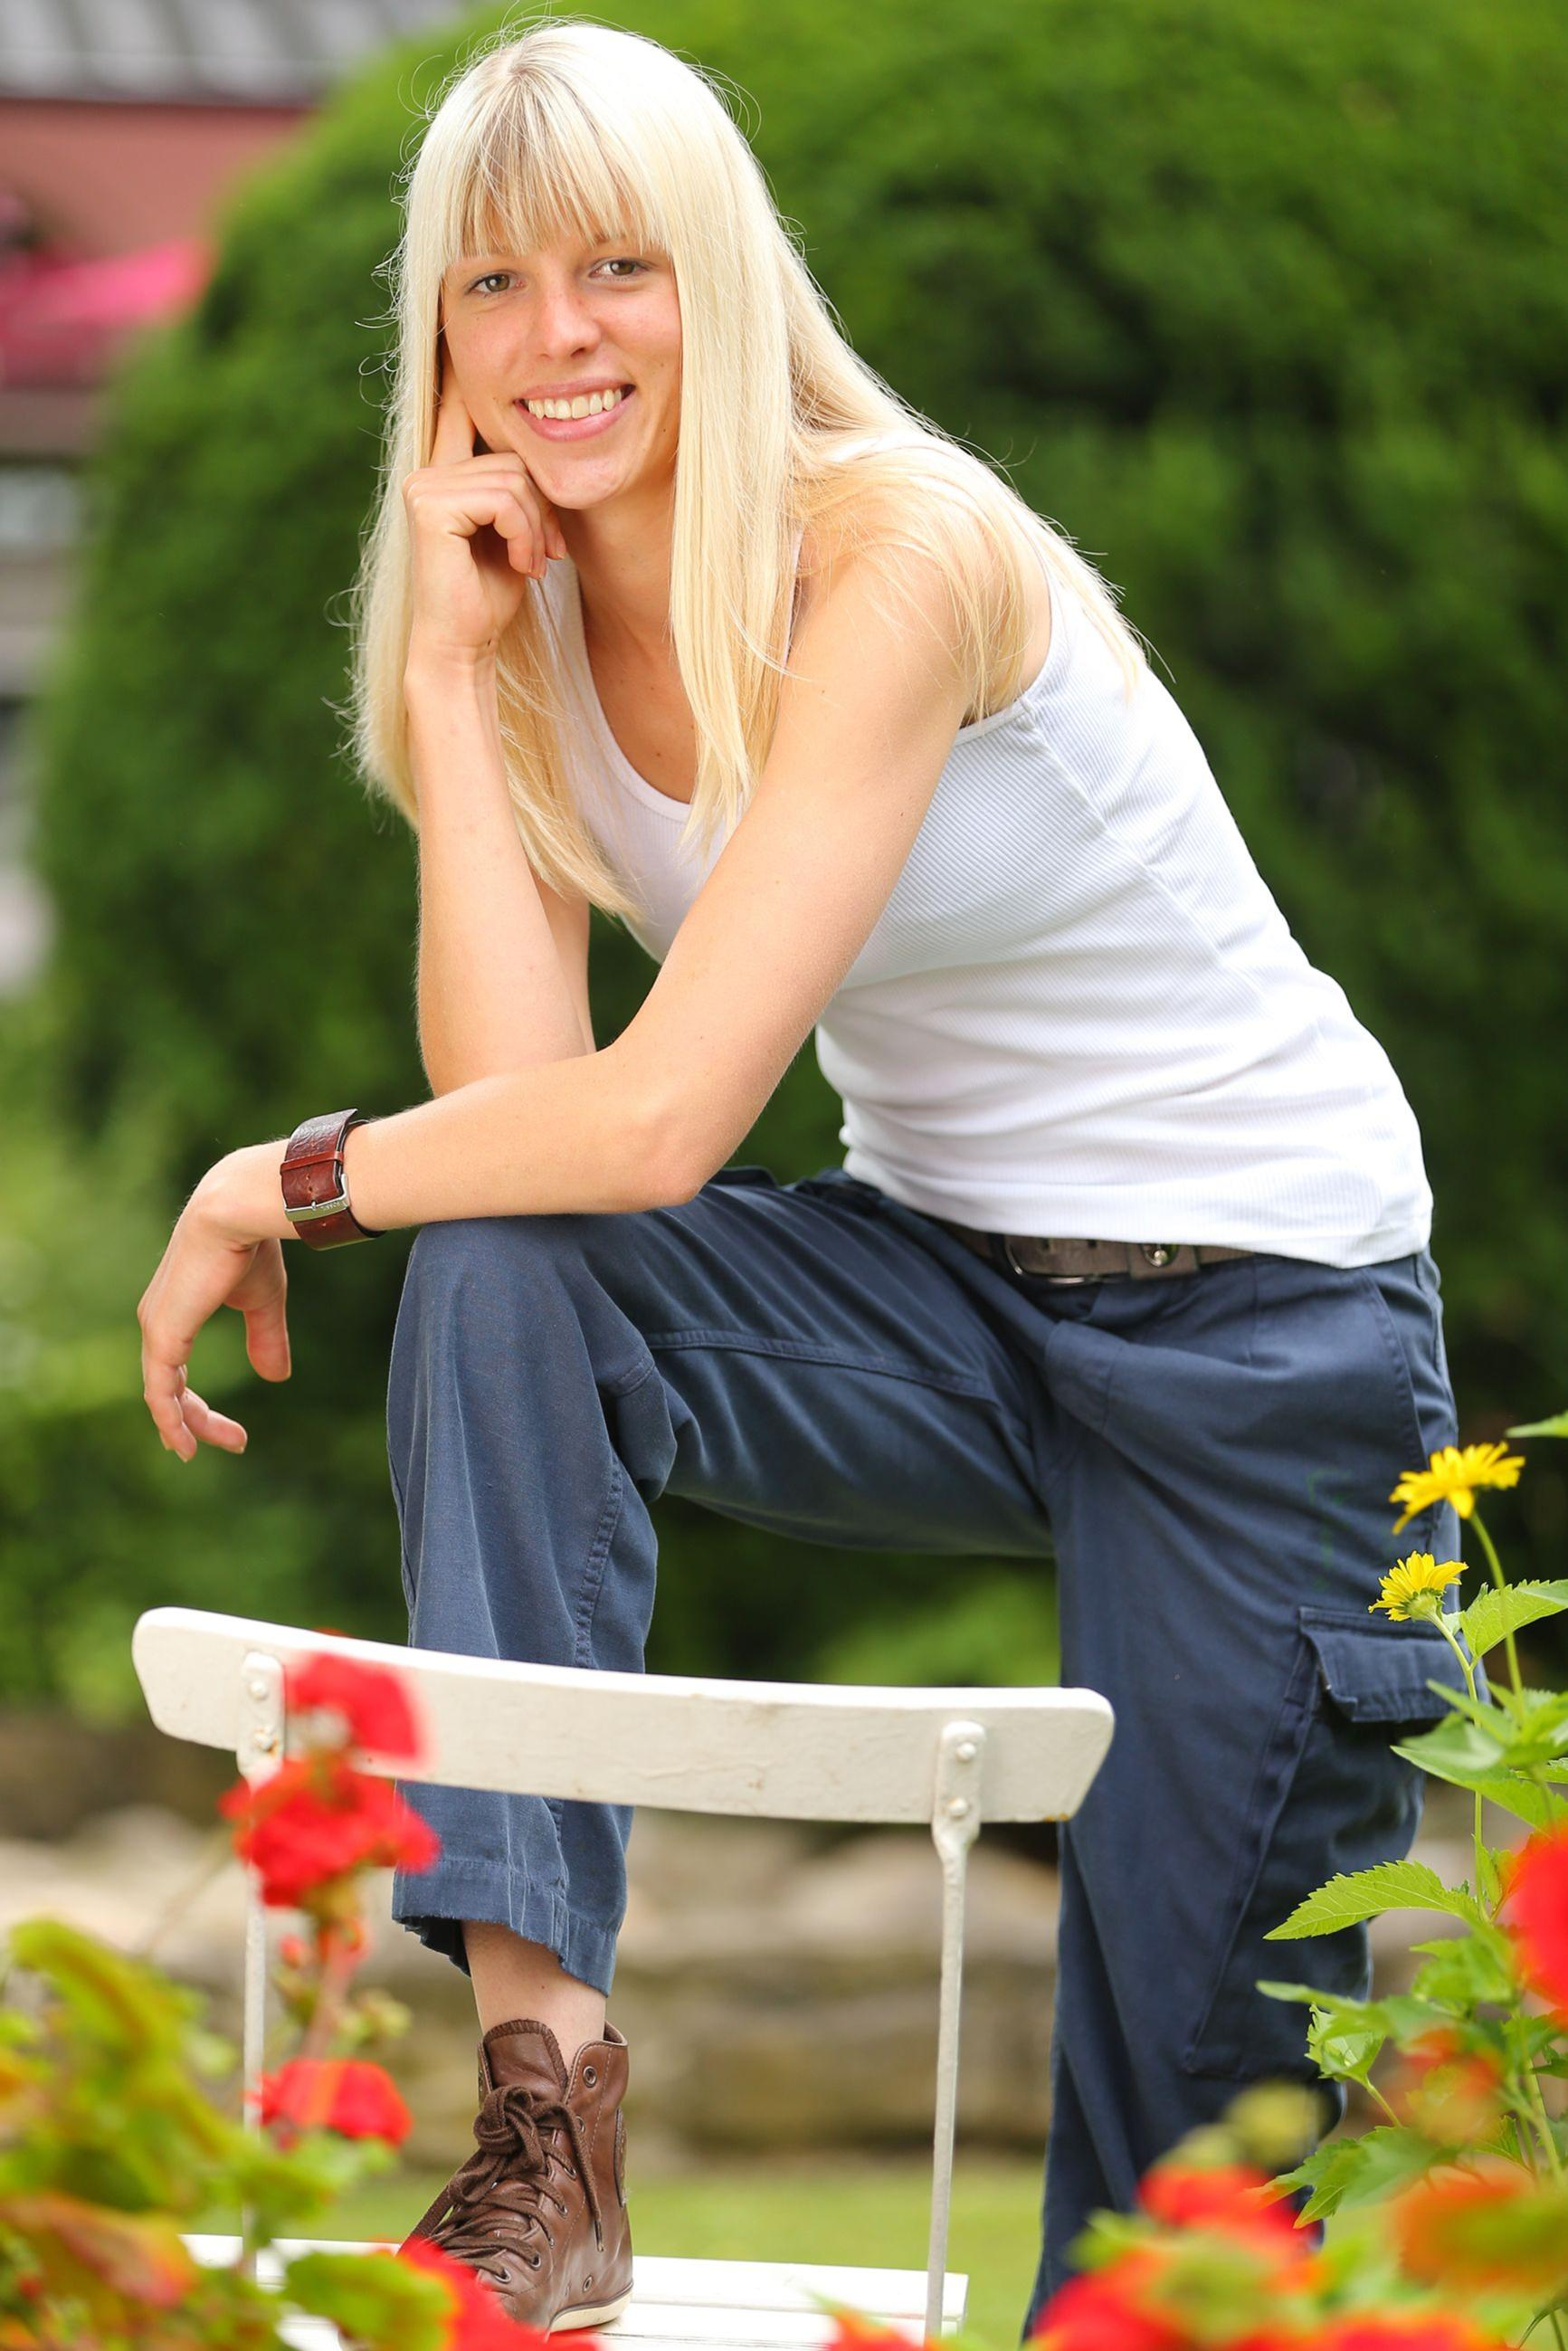 Bauer sucht Frau 2013 - Lena